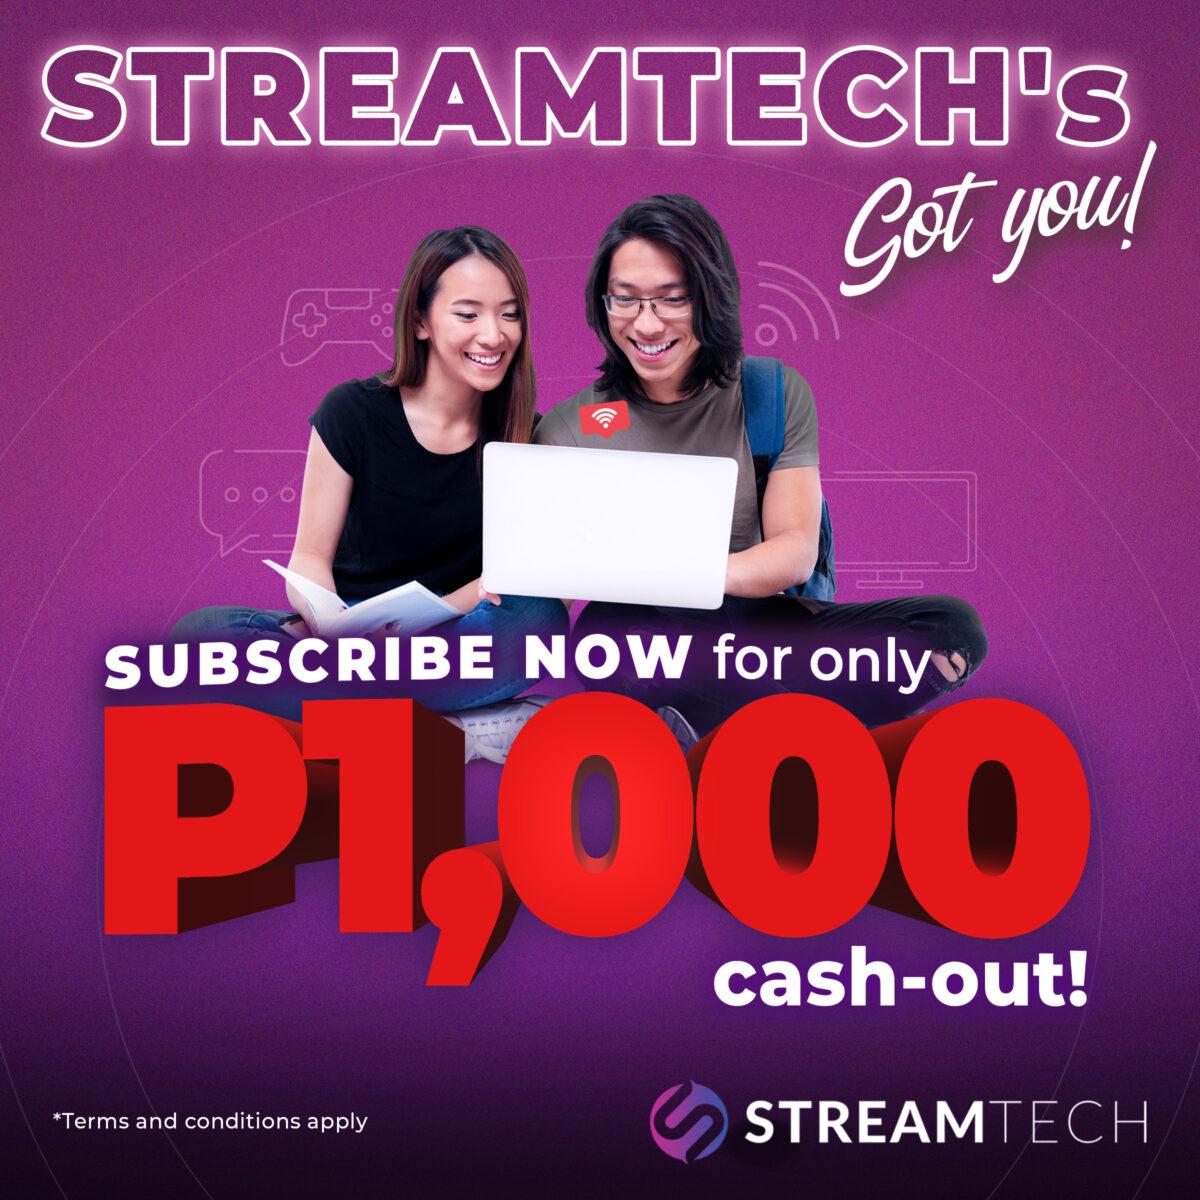 Streamtech Fiber Internet Got Your Back